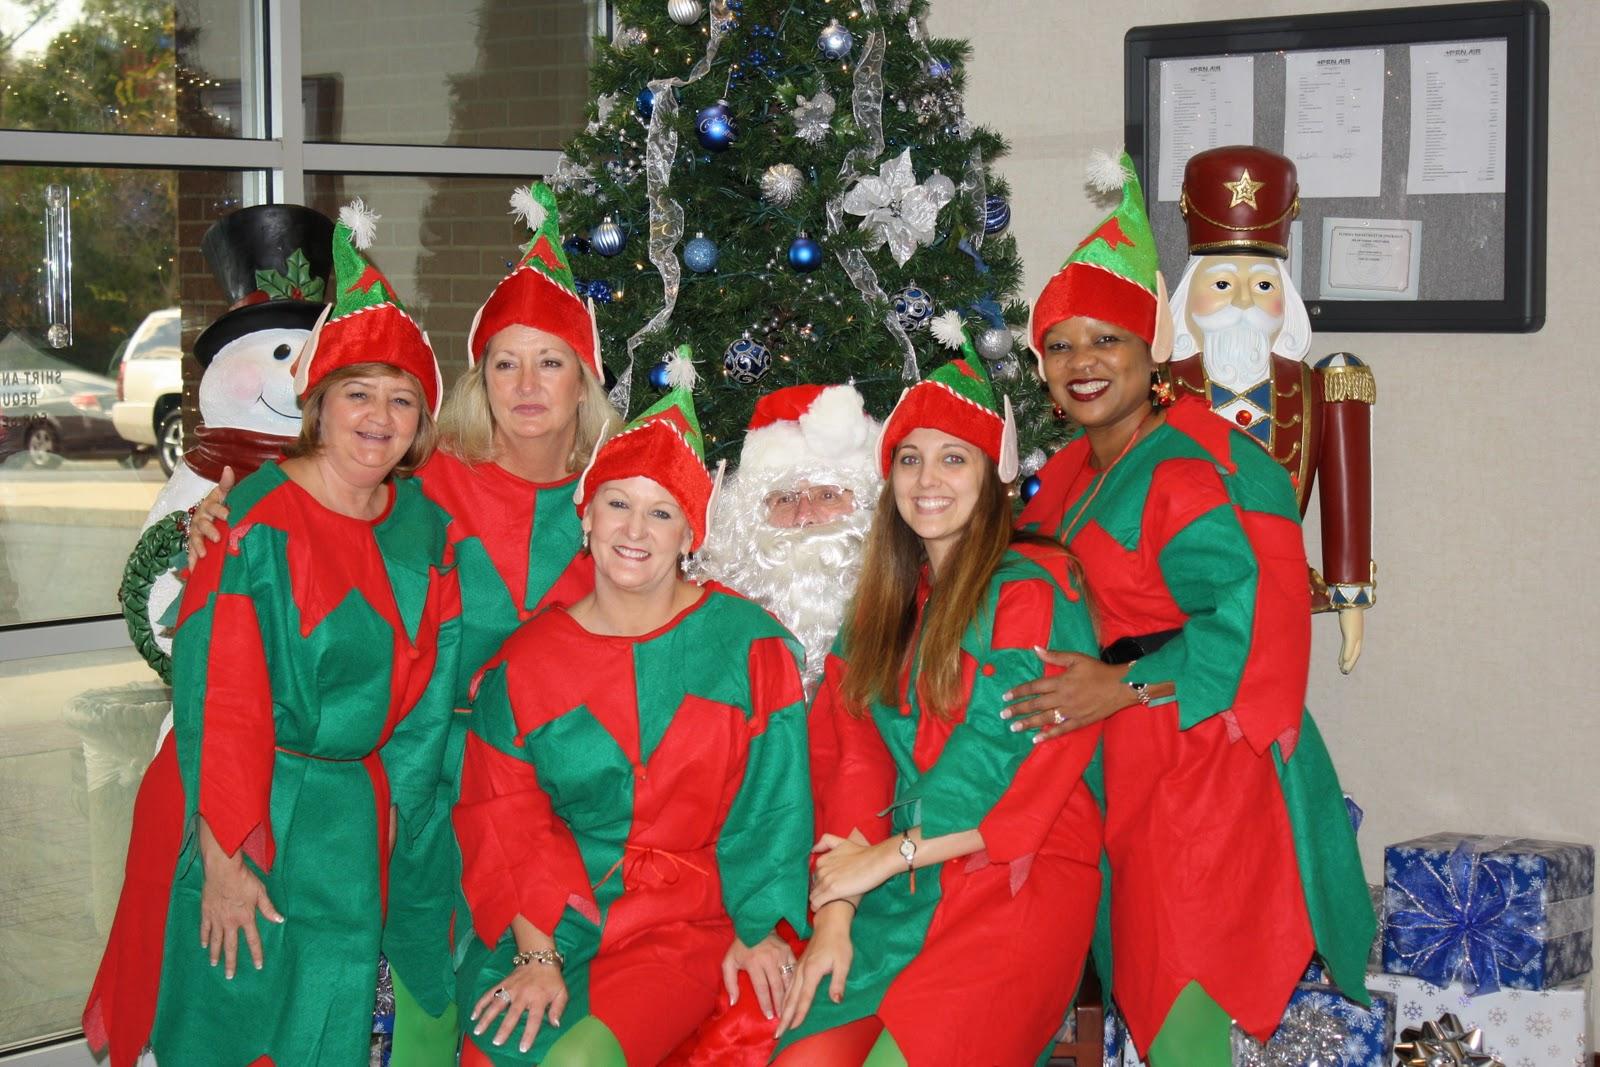 Northwest Federal Credit Union >> Pen Air Federal Credit Union: Santa and his elves visit Pen Air...